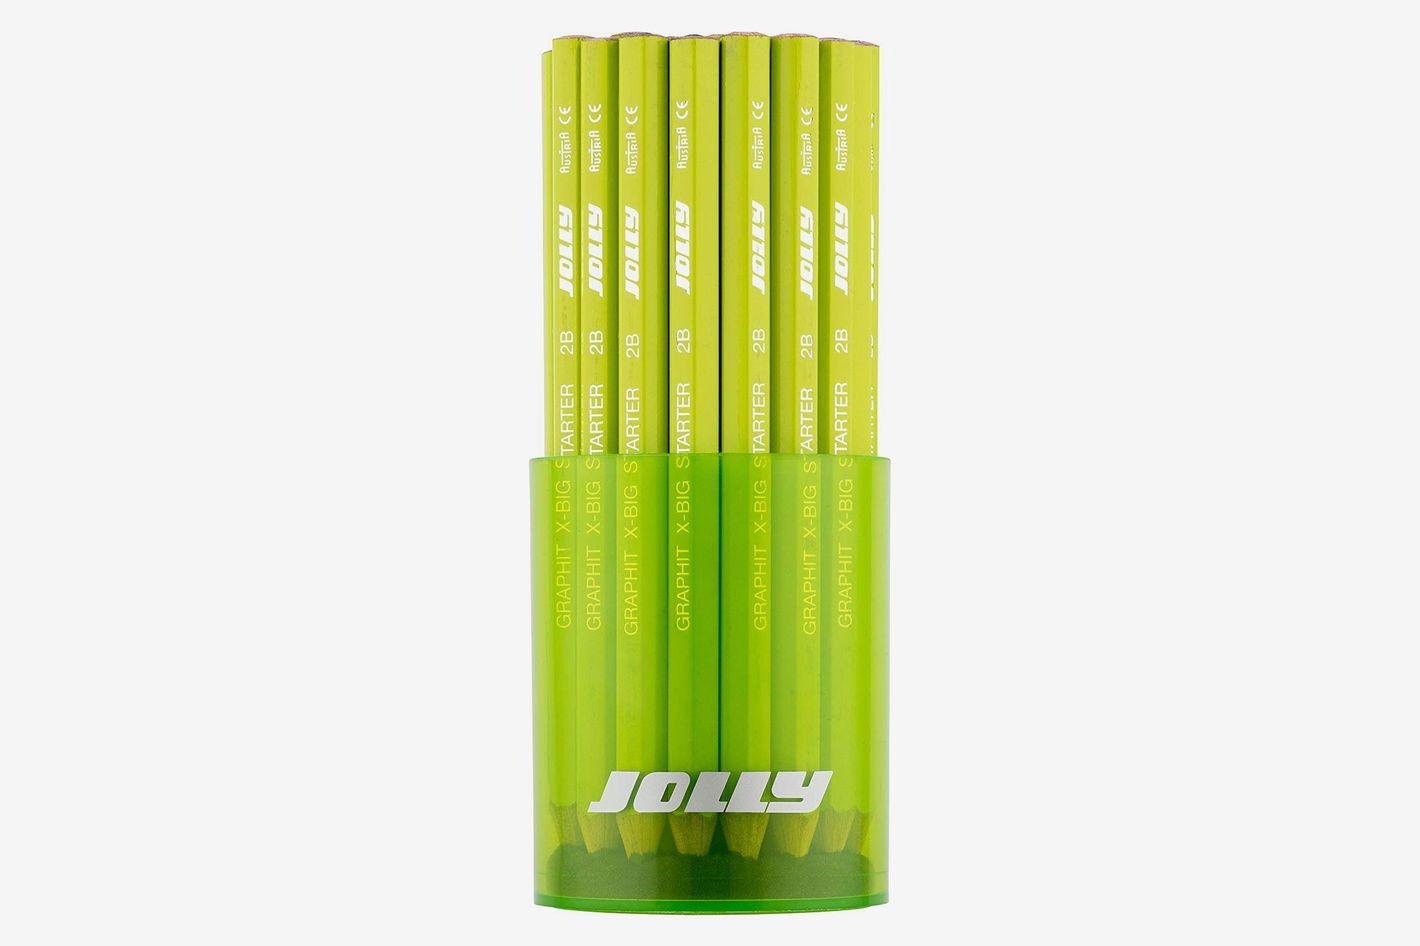 Jolly X-Big Jumbo-Sized 2B Graphite Pencils with Storage Tub